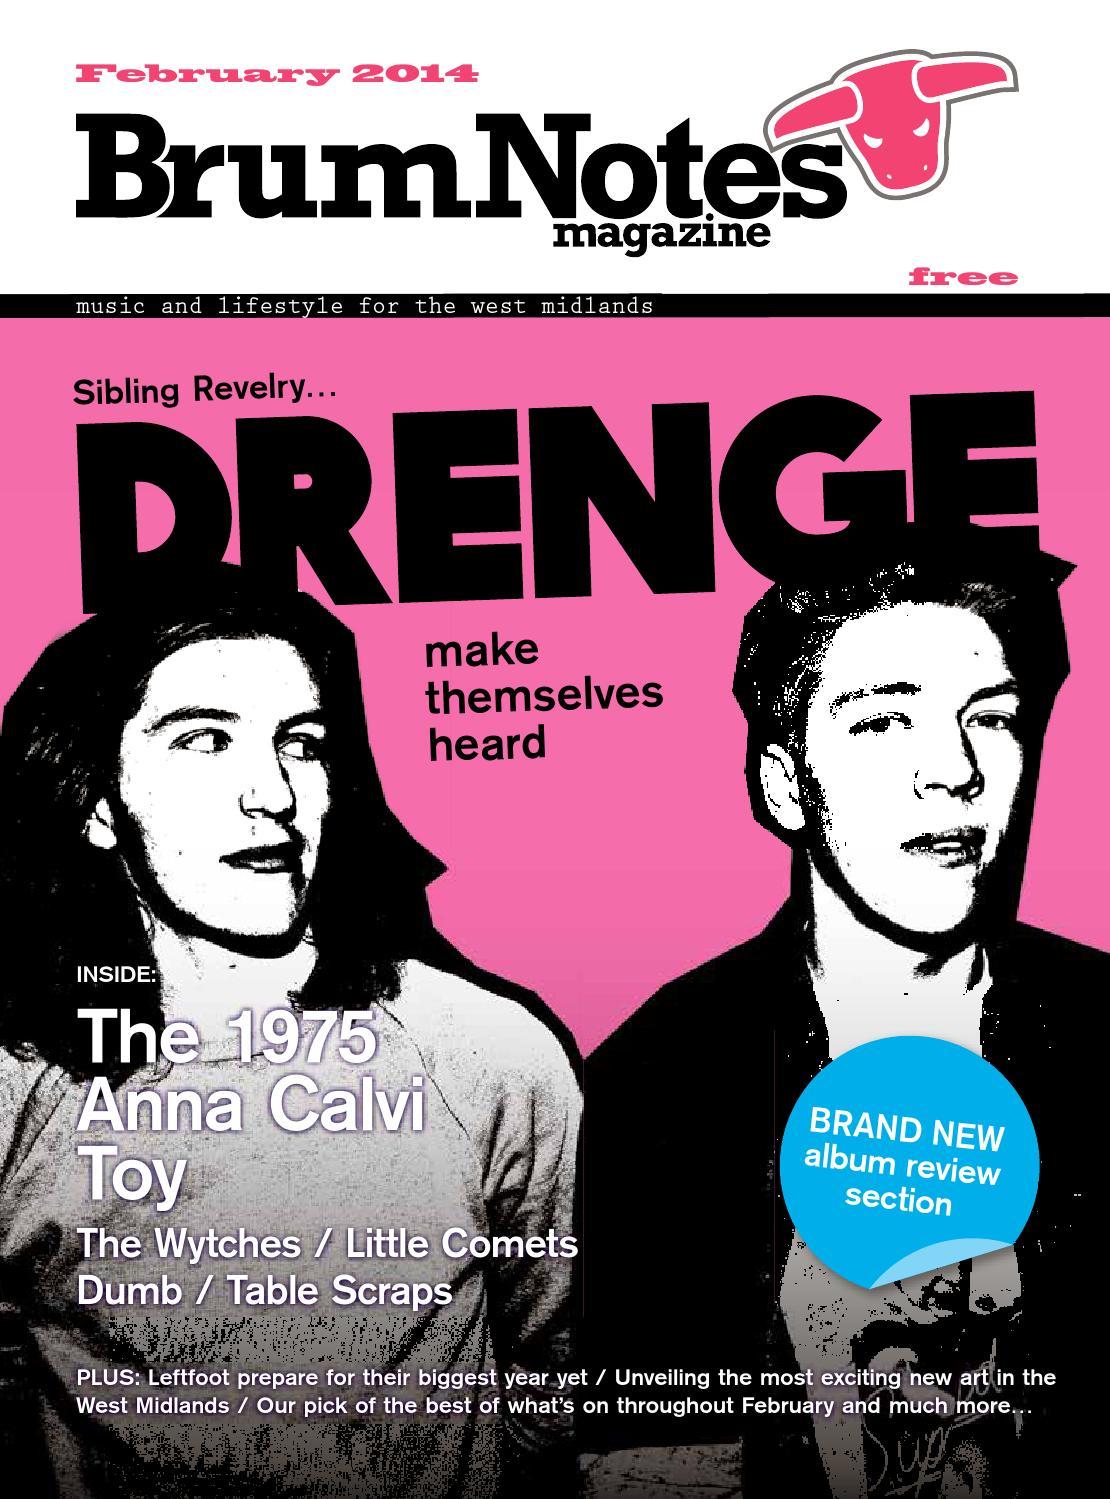 b1dc5991909db9 Brum Notes Magazine - February 2014 by Brum Notes Magazine - issuu